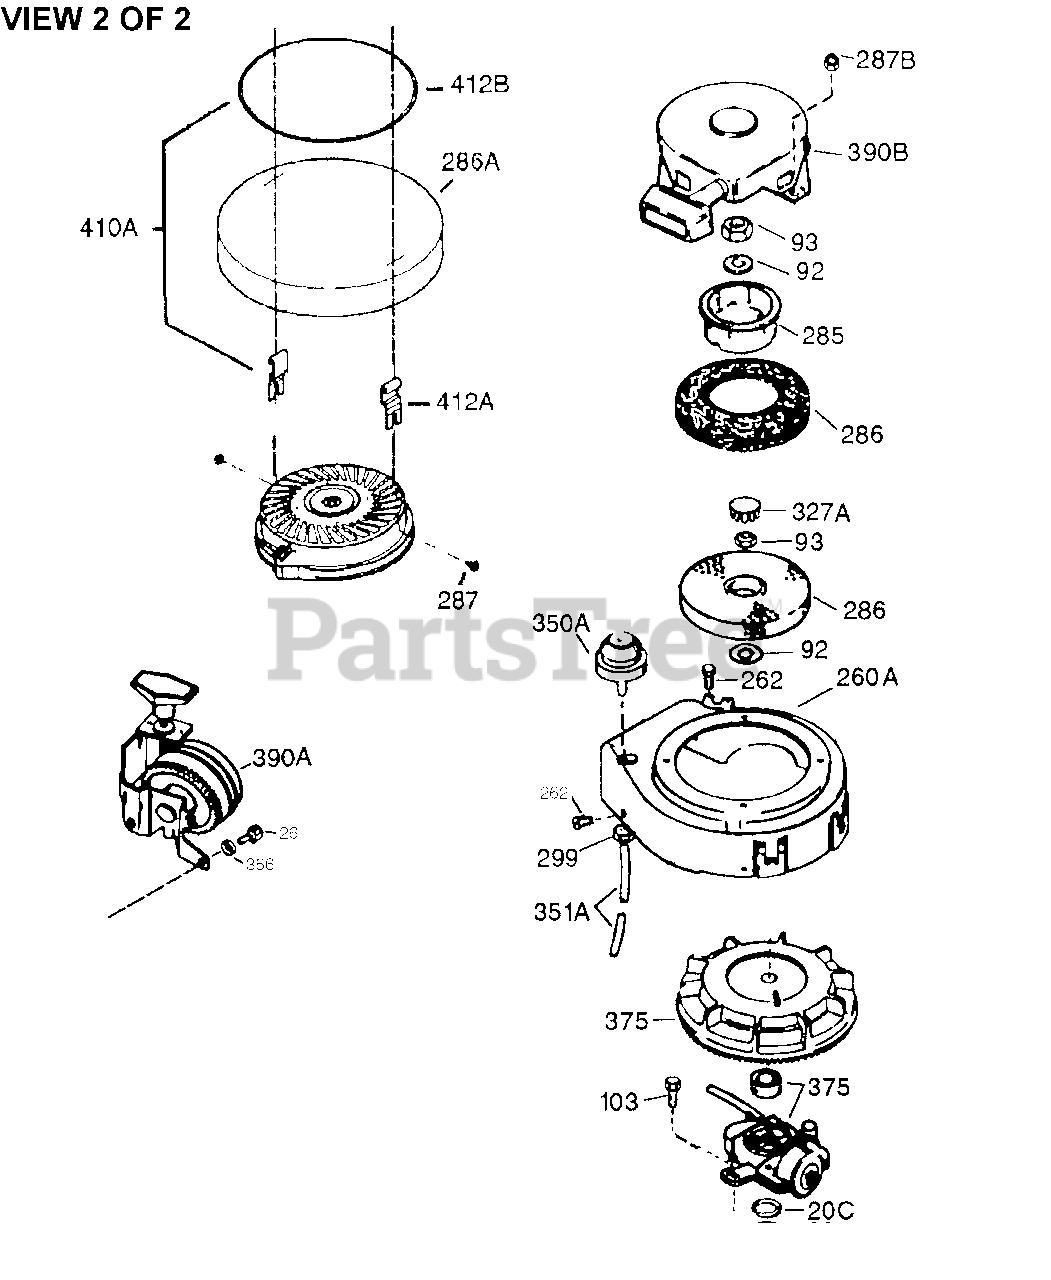 Tecumseh AV520-670-102 - Tecumseh Engine Engine Parts List #2 Parts Lookup  with Diagrams | PartsTreePartsTree